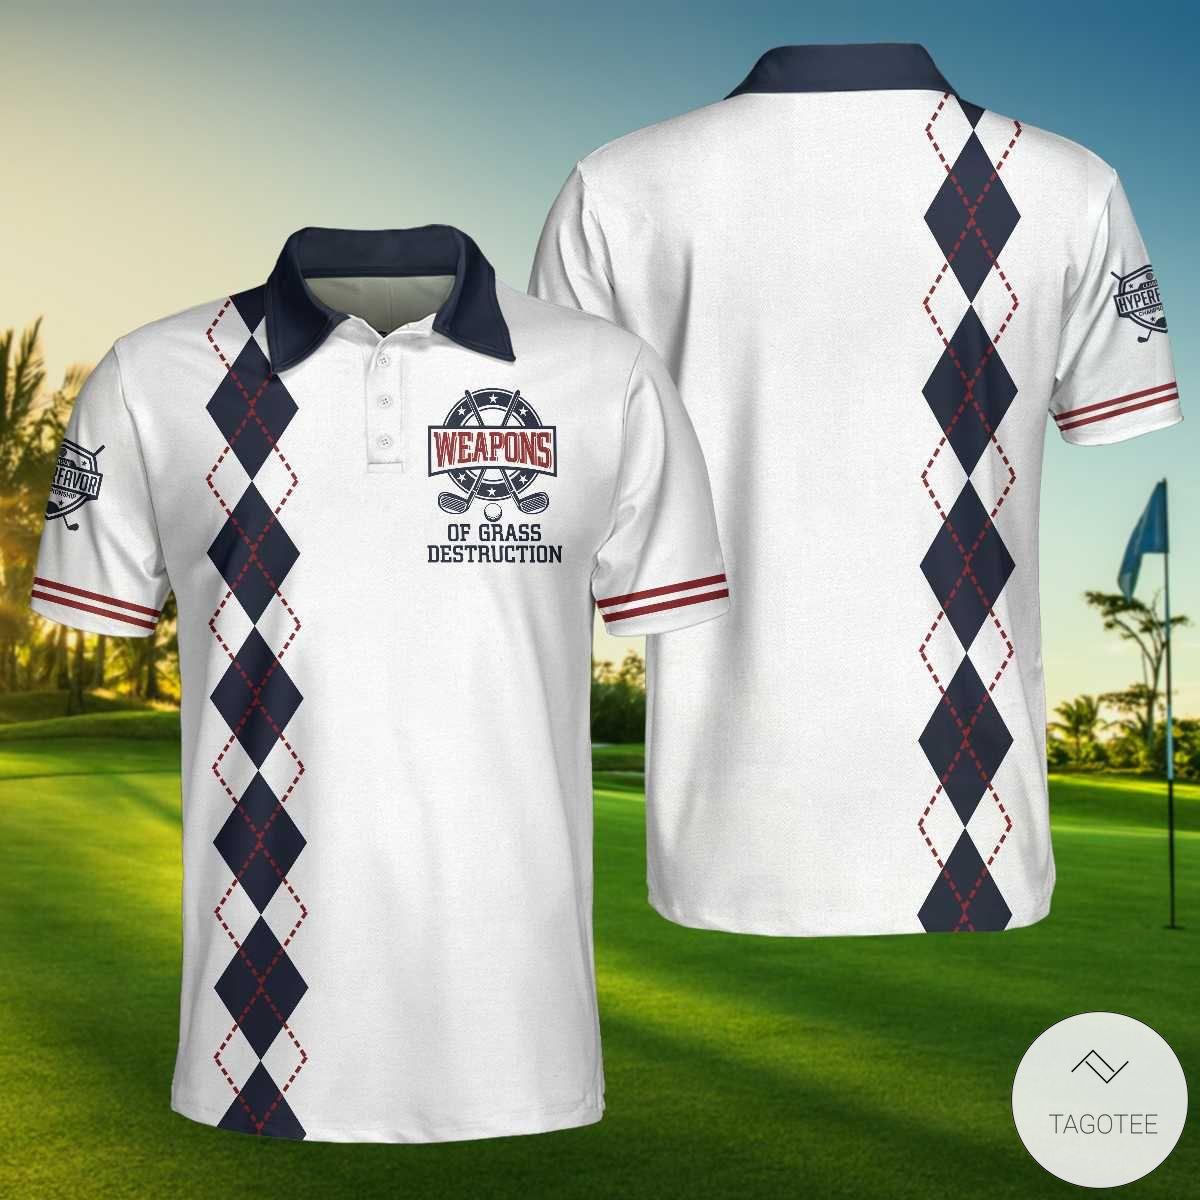 Golf Weapons Of Grass Destruction Polo Shirtx